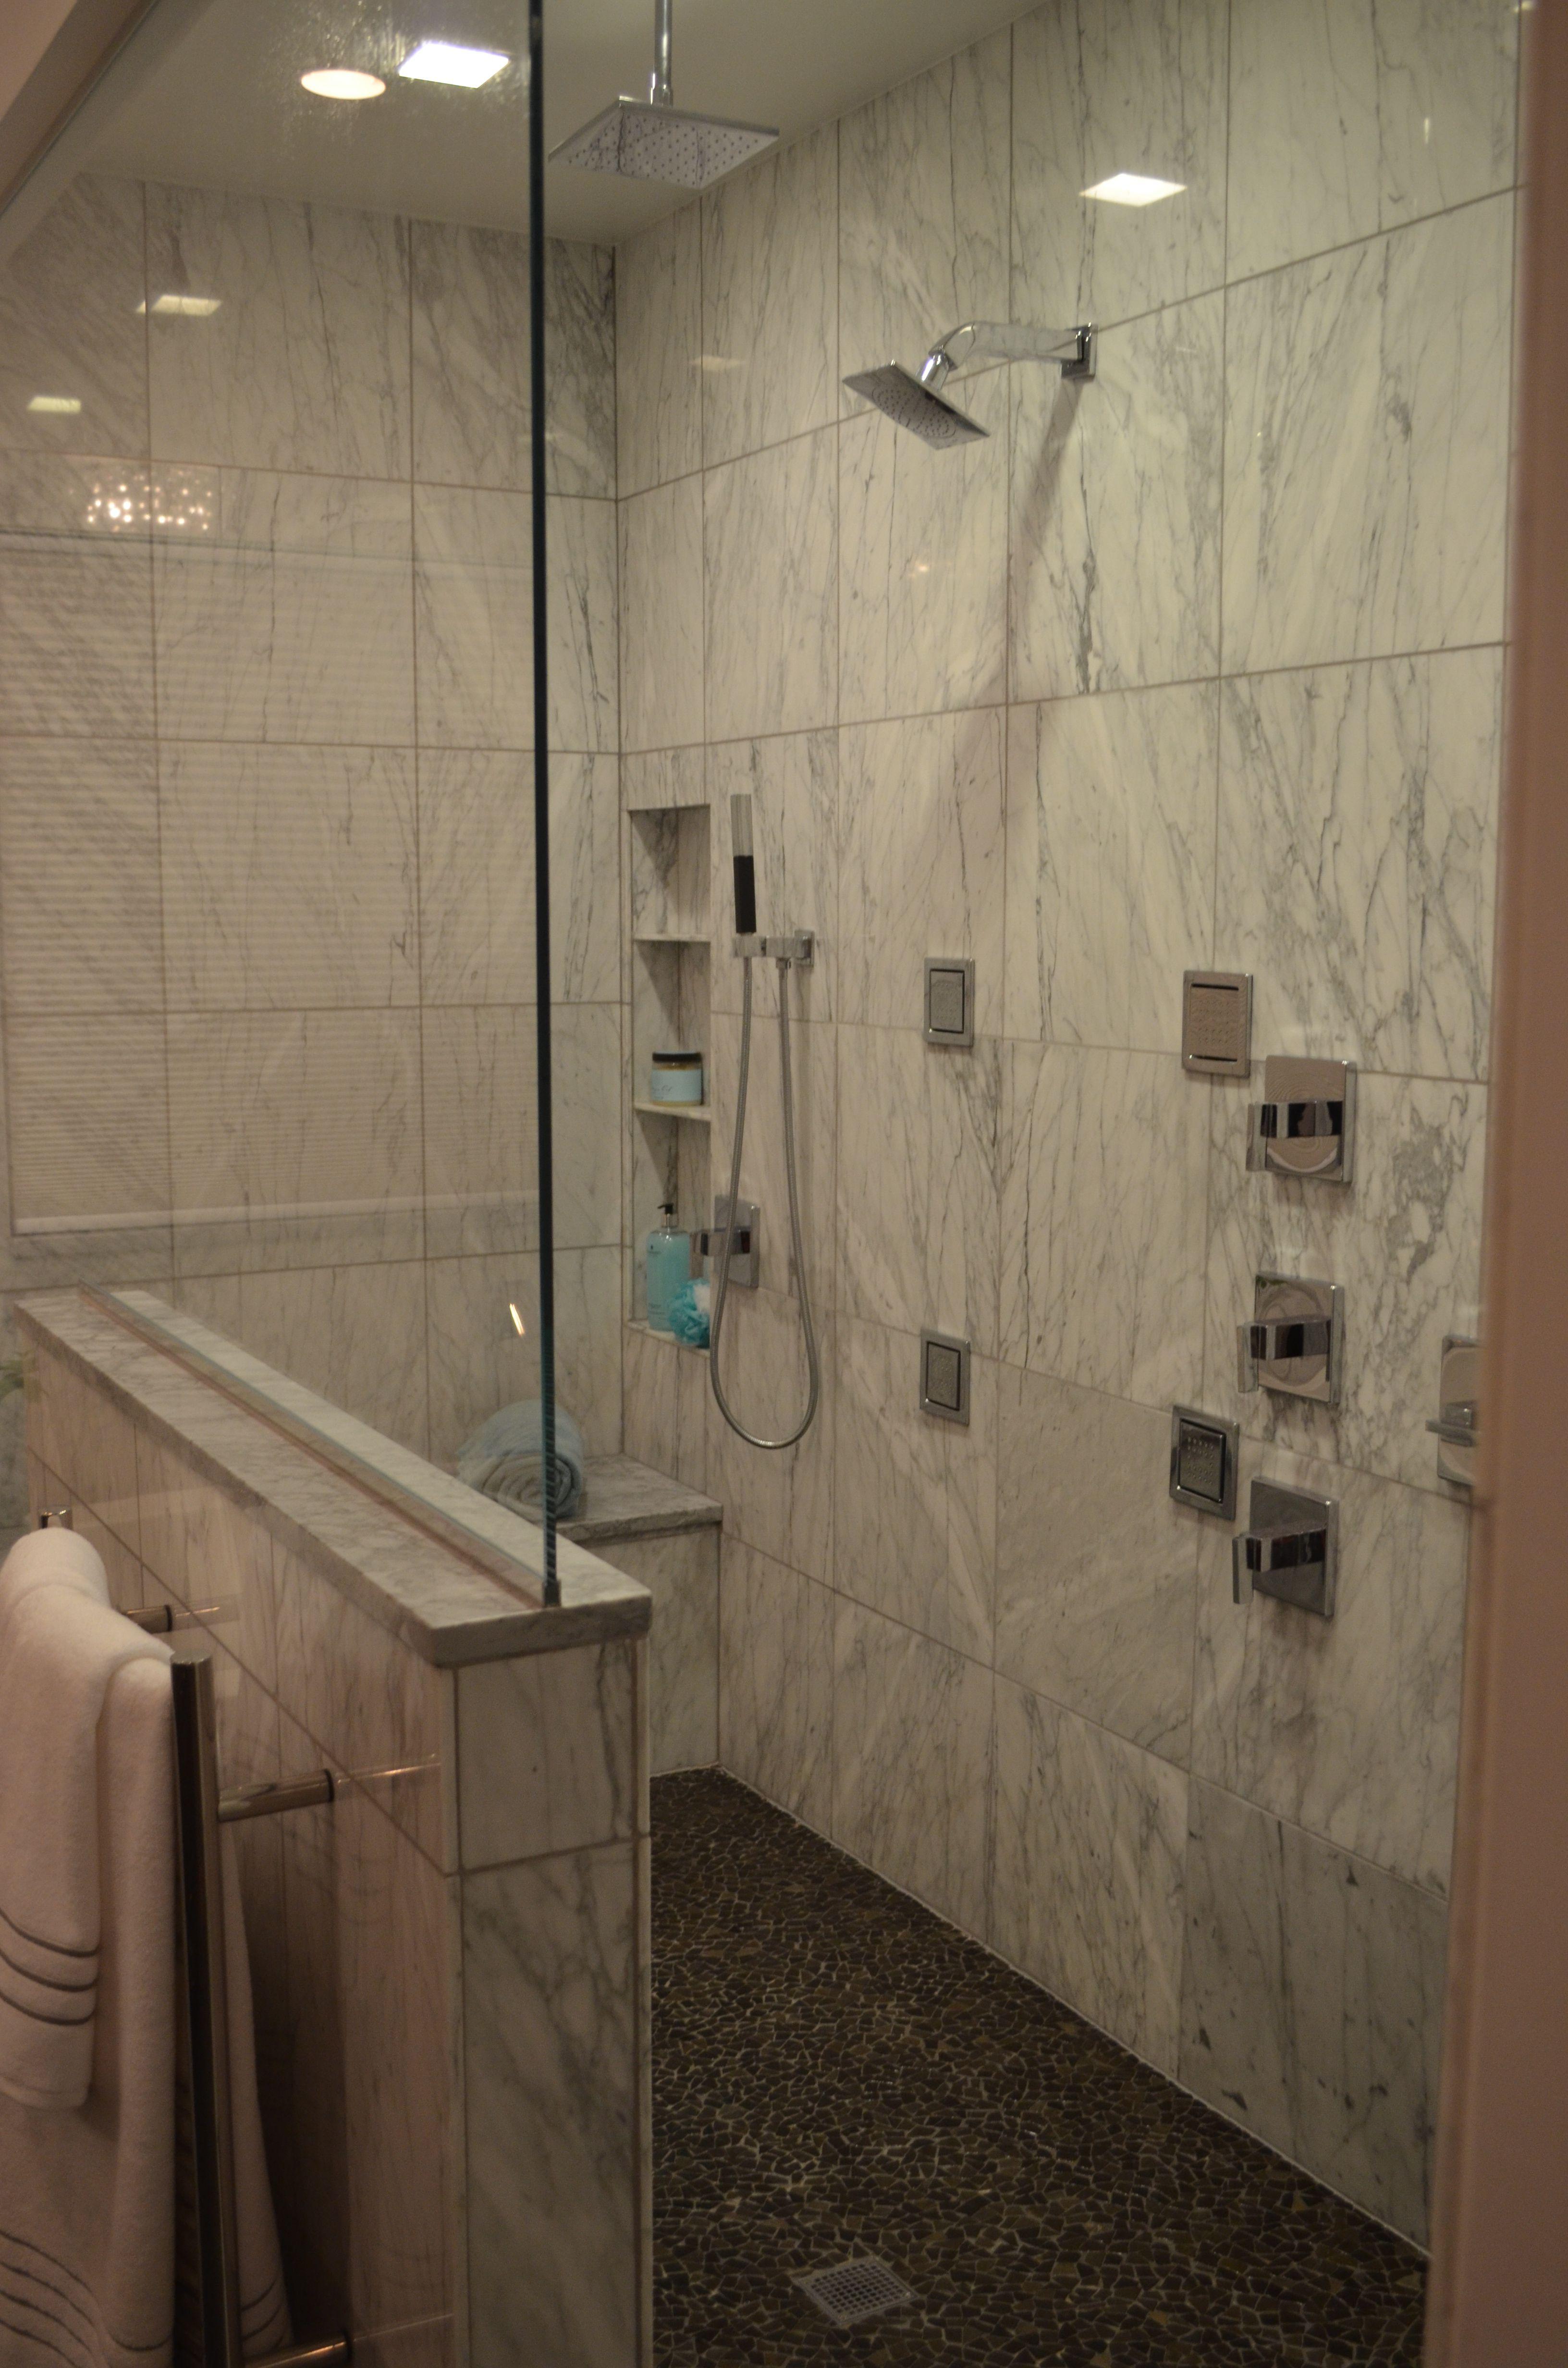 Walk In Shower With Carrara Marble Kohler Loure Fixtures To Include Body Sprayers Rain Shower Head Tradition Shower Tile Elegant Bathroom Rain Shower Head